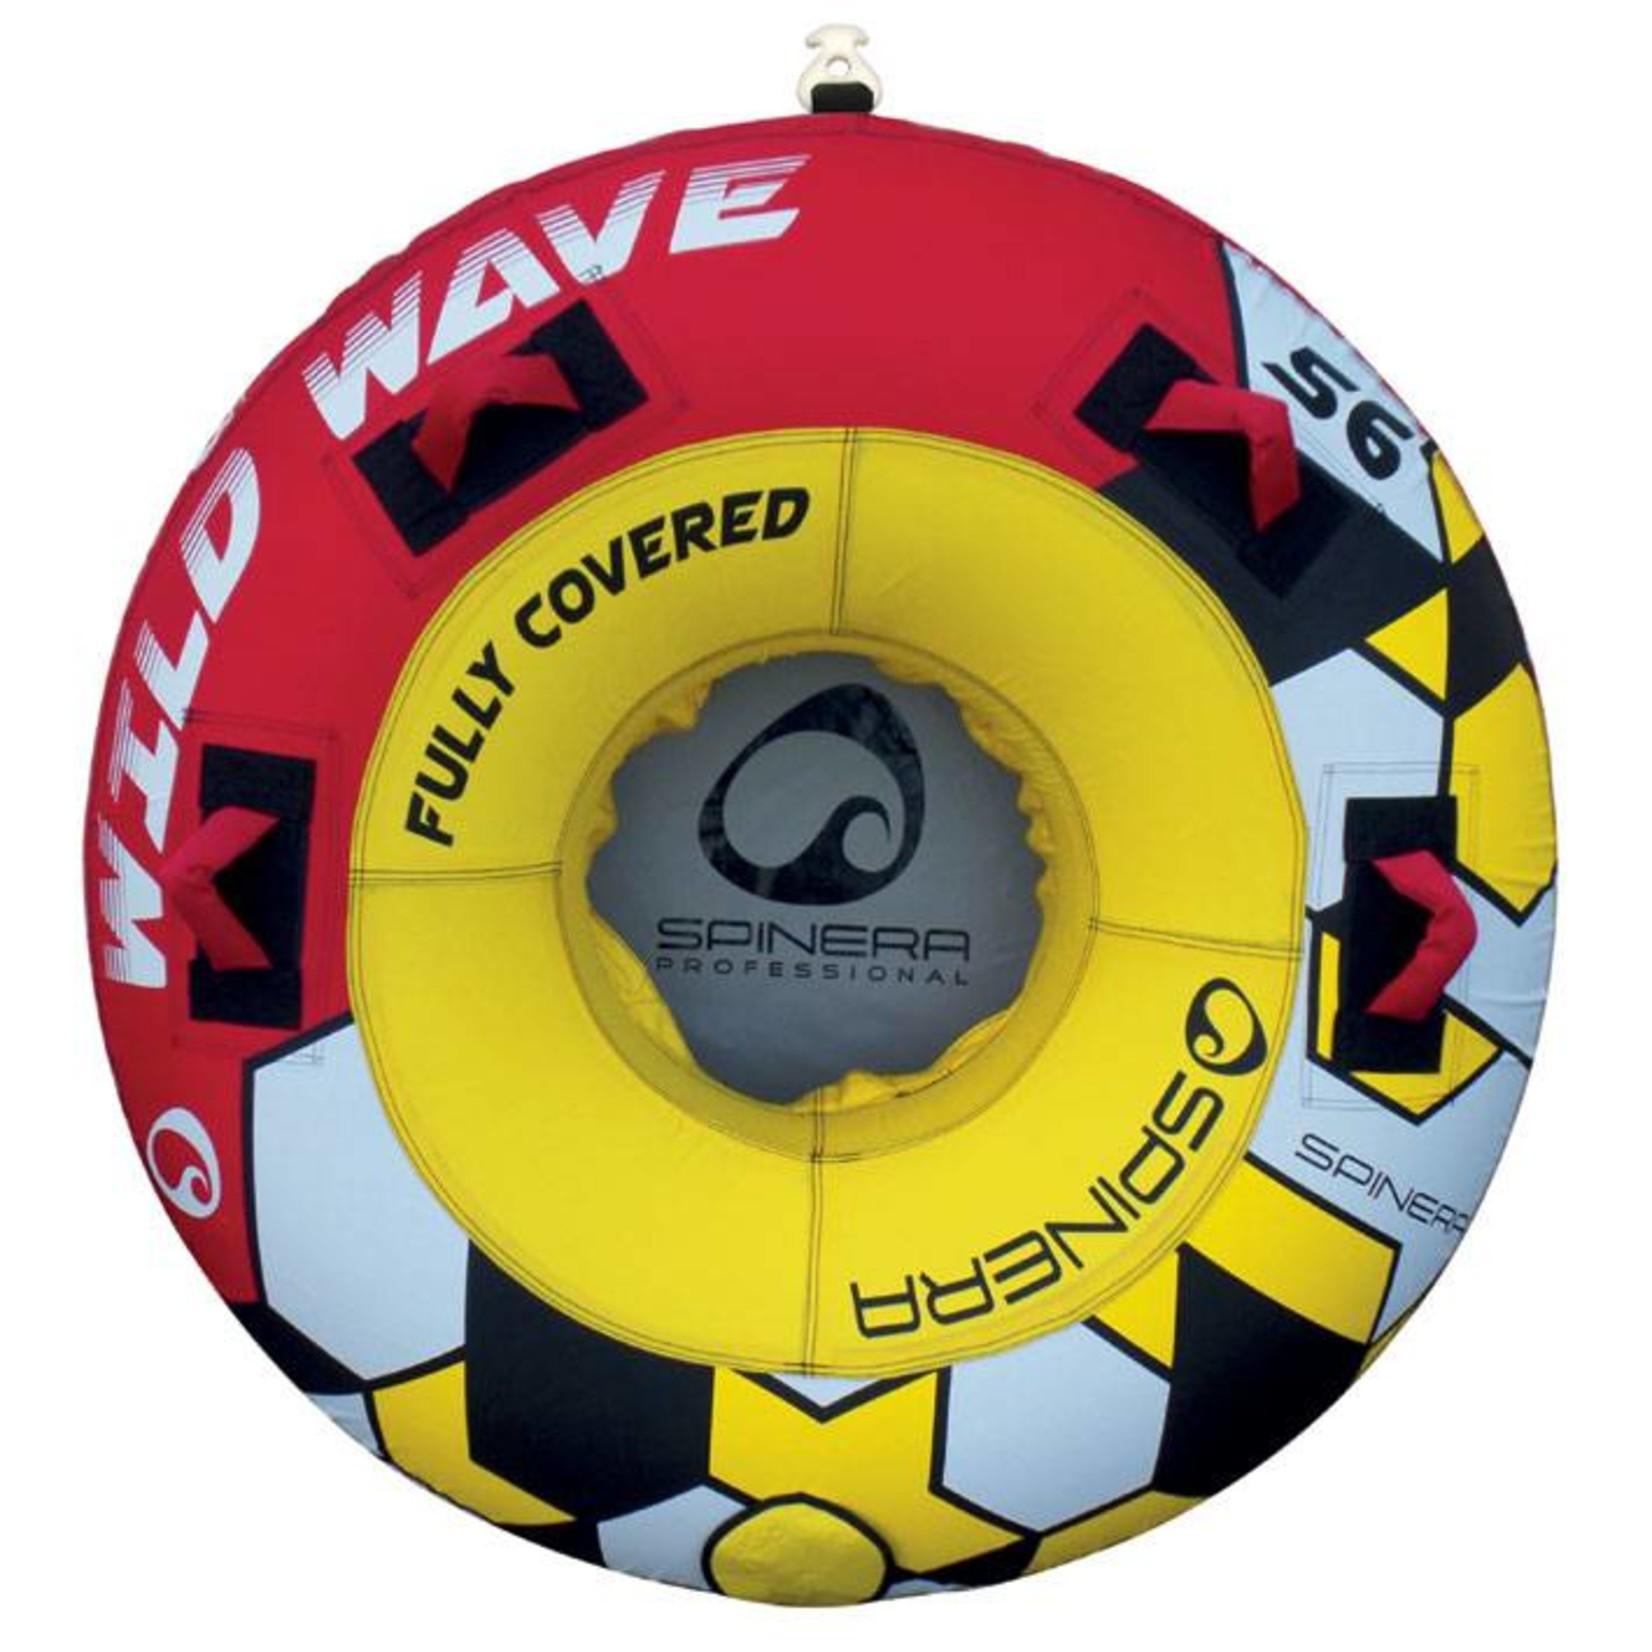 Spinera Professional Wild Wave - Single Tube